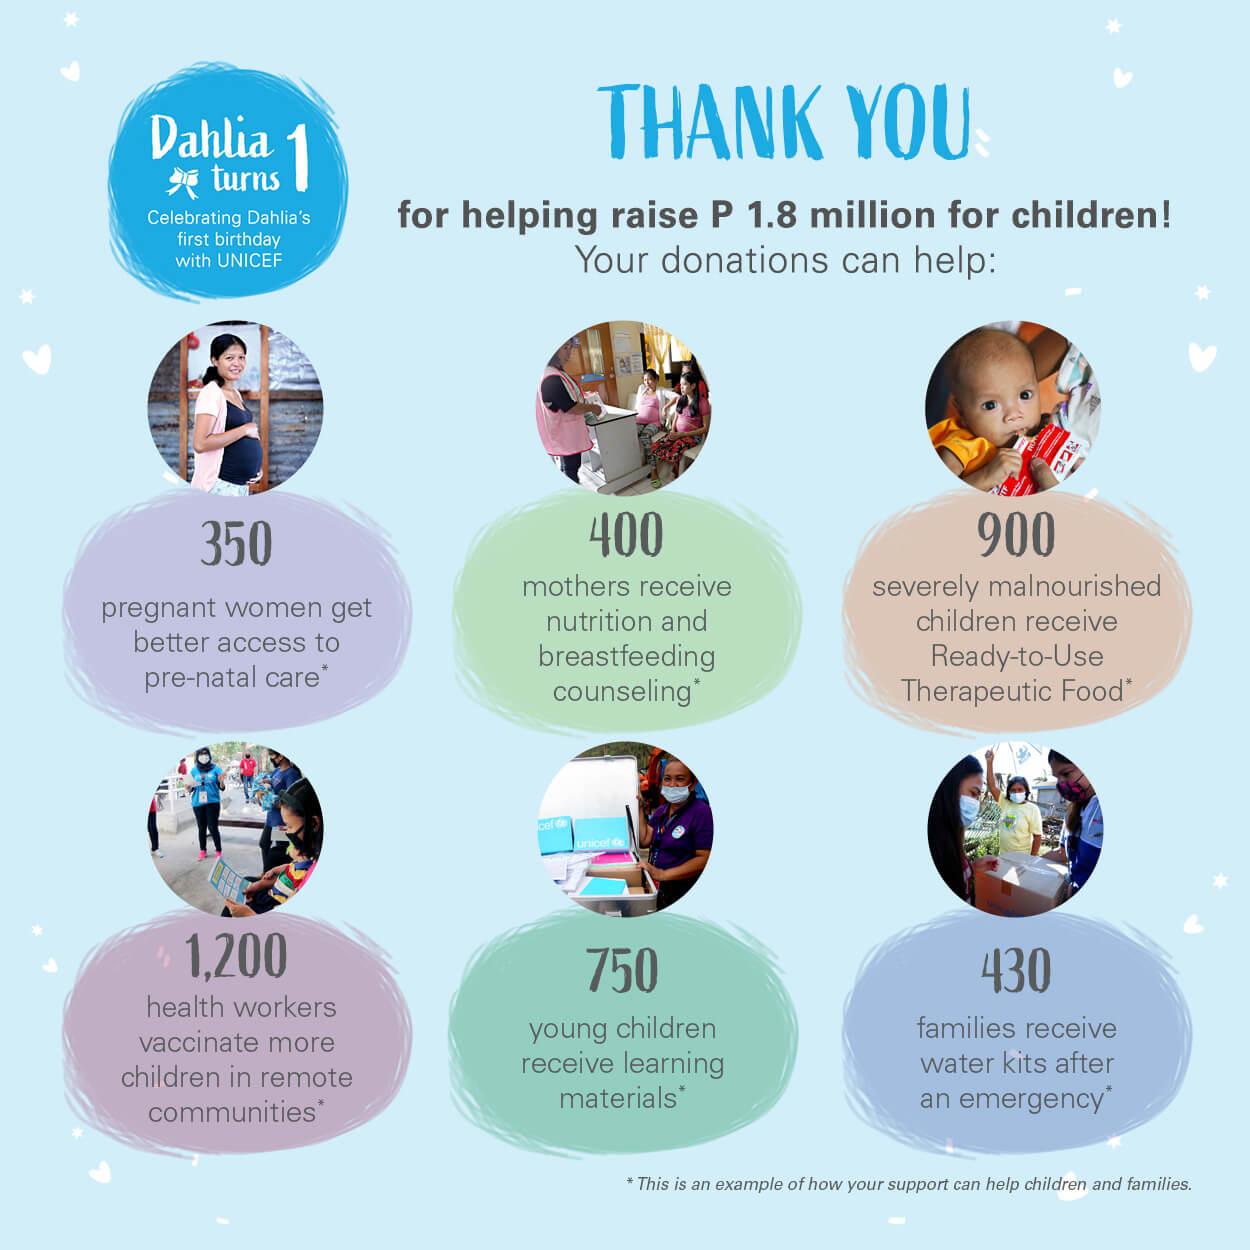 Anne Curtis UNICEF fundraiser for Filipino children